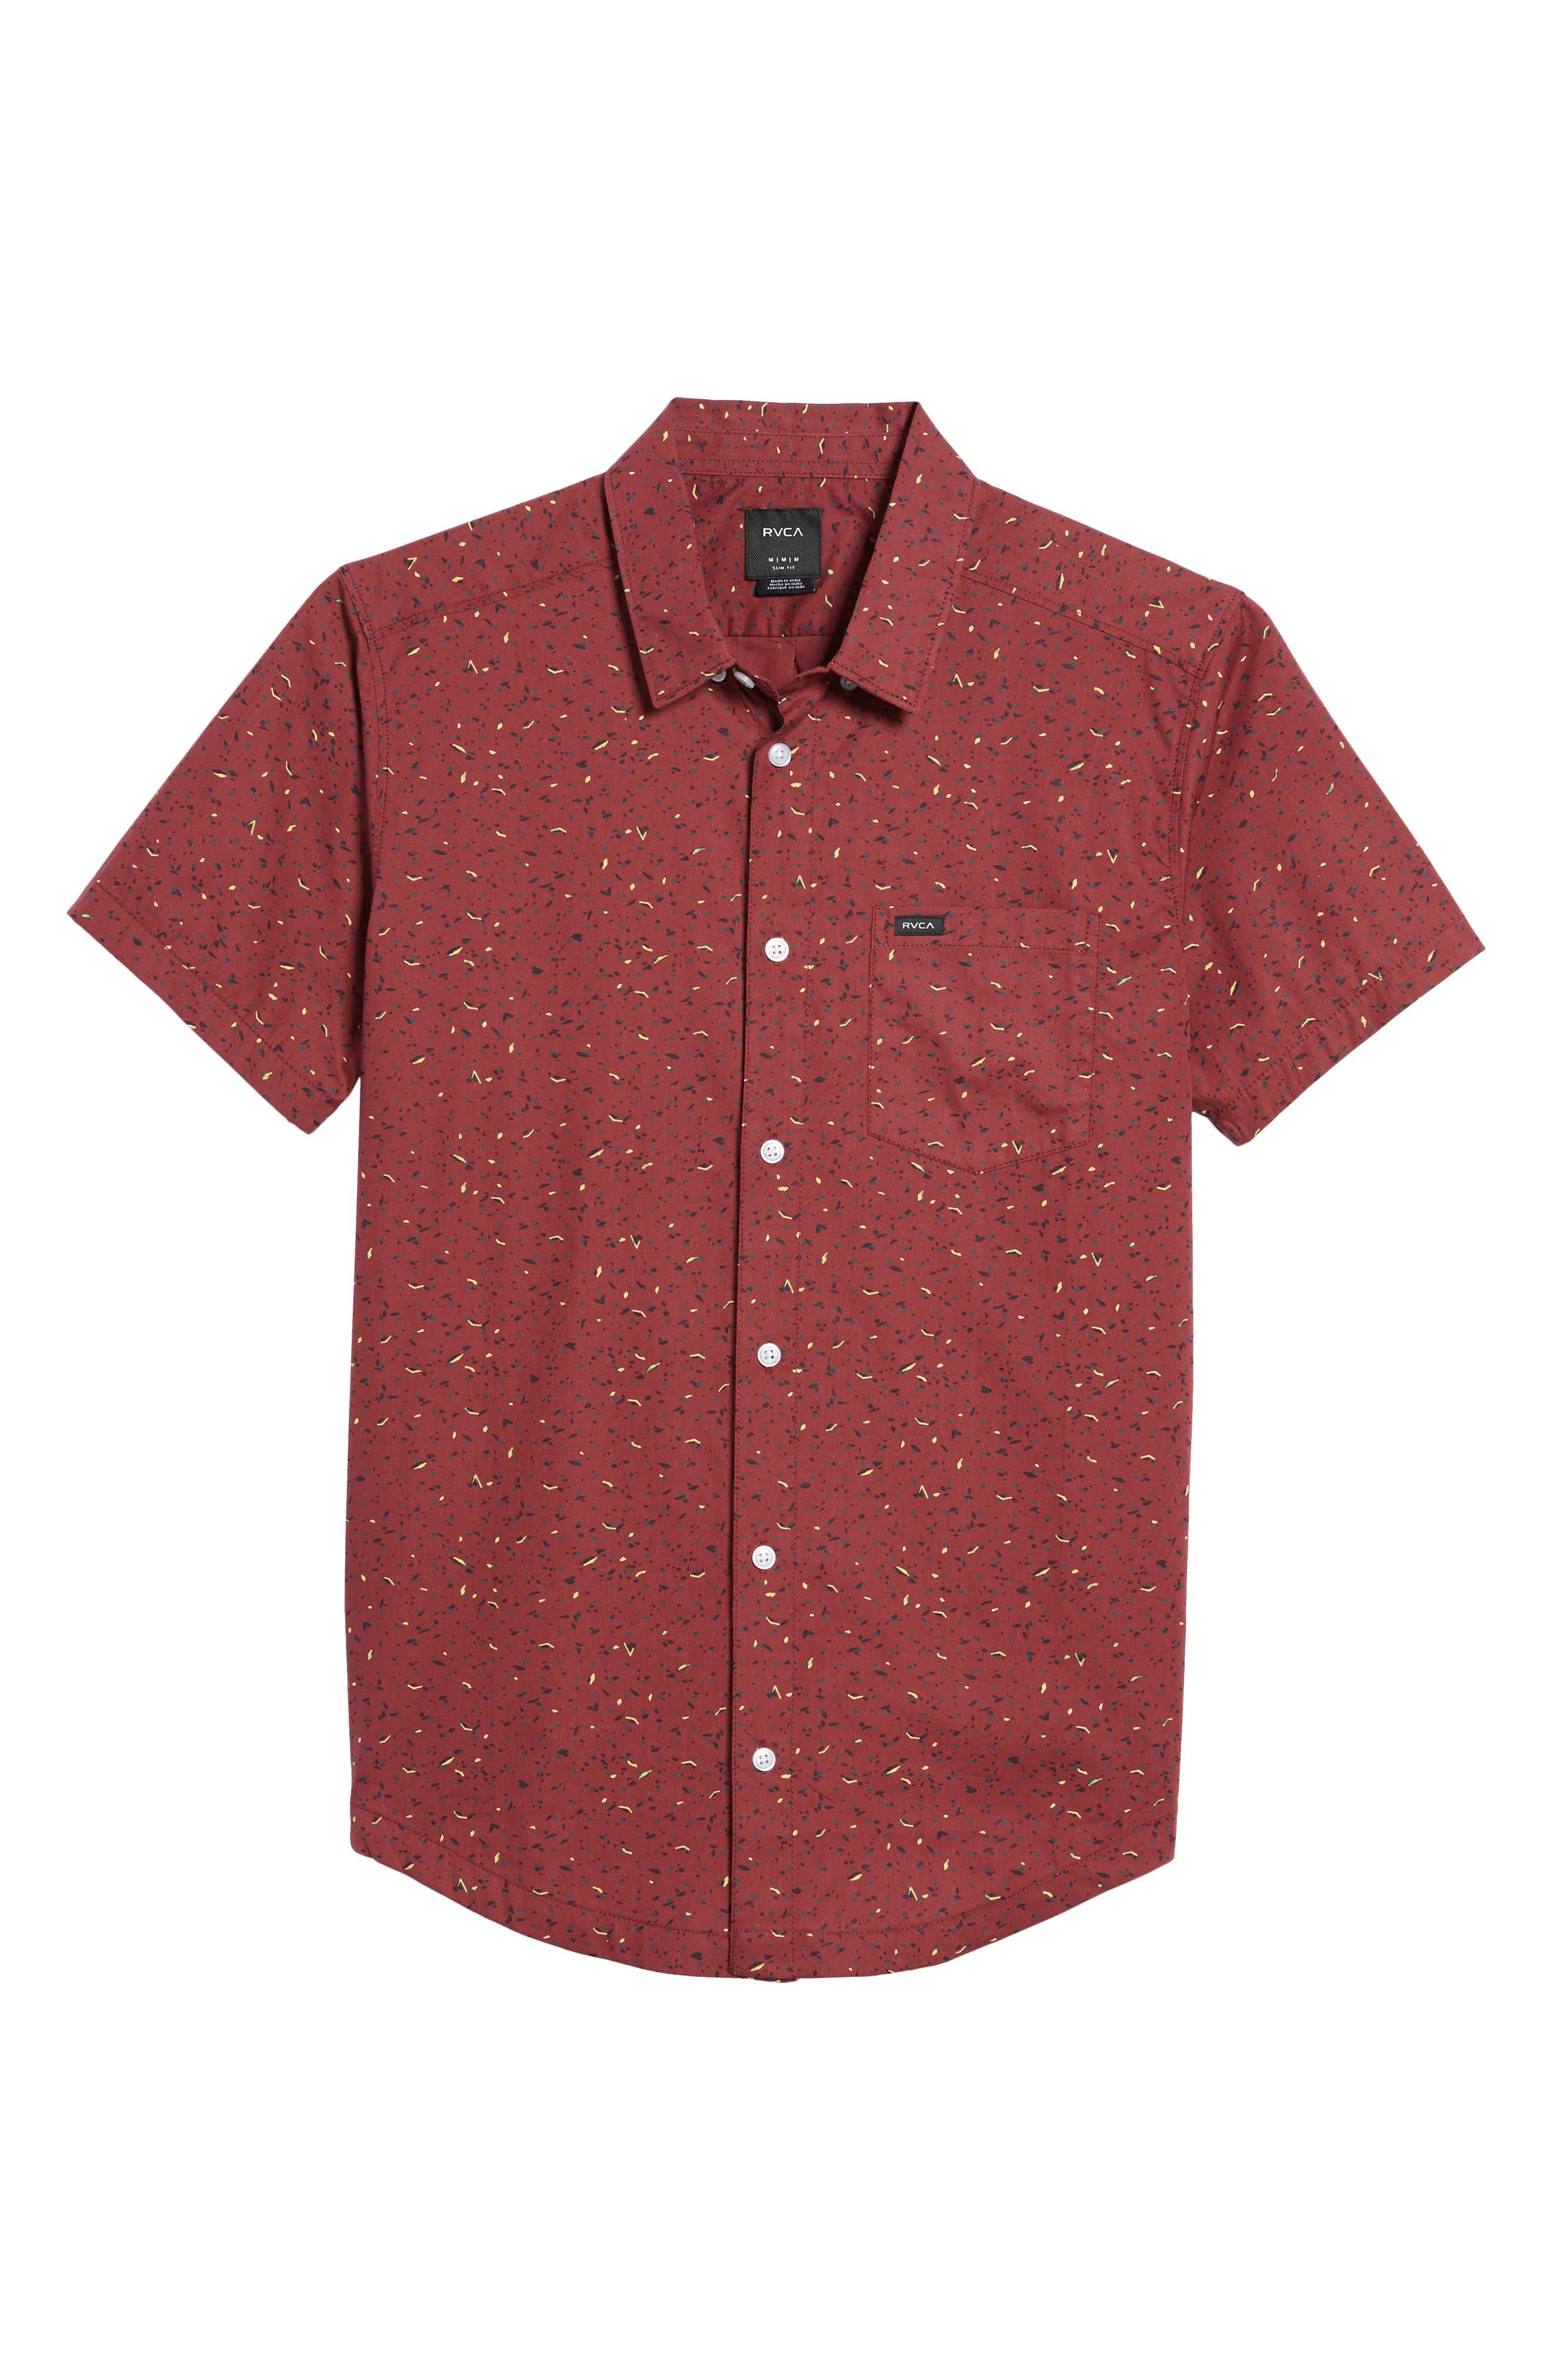 Jaded Woven Shirt,                             Alternate thumbnail 12, color,